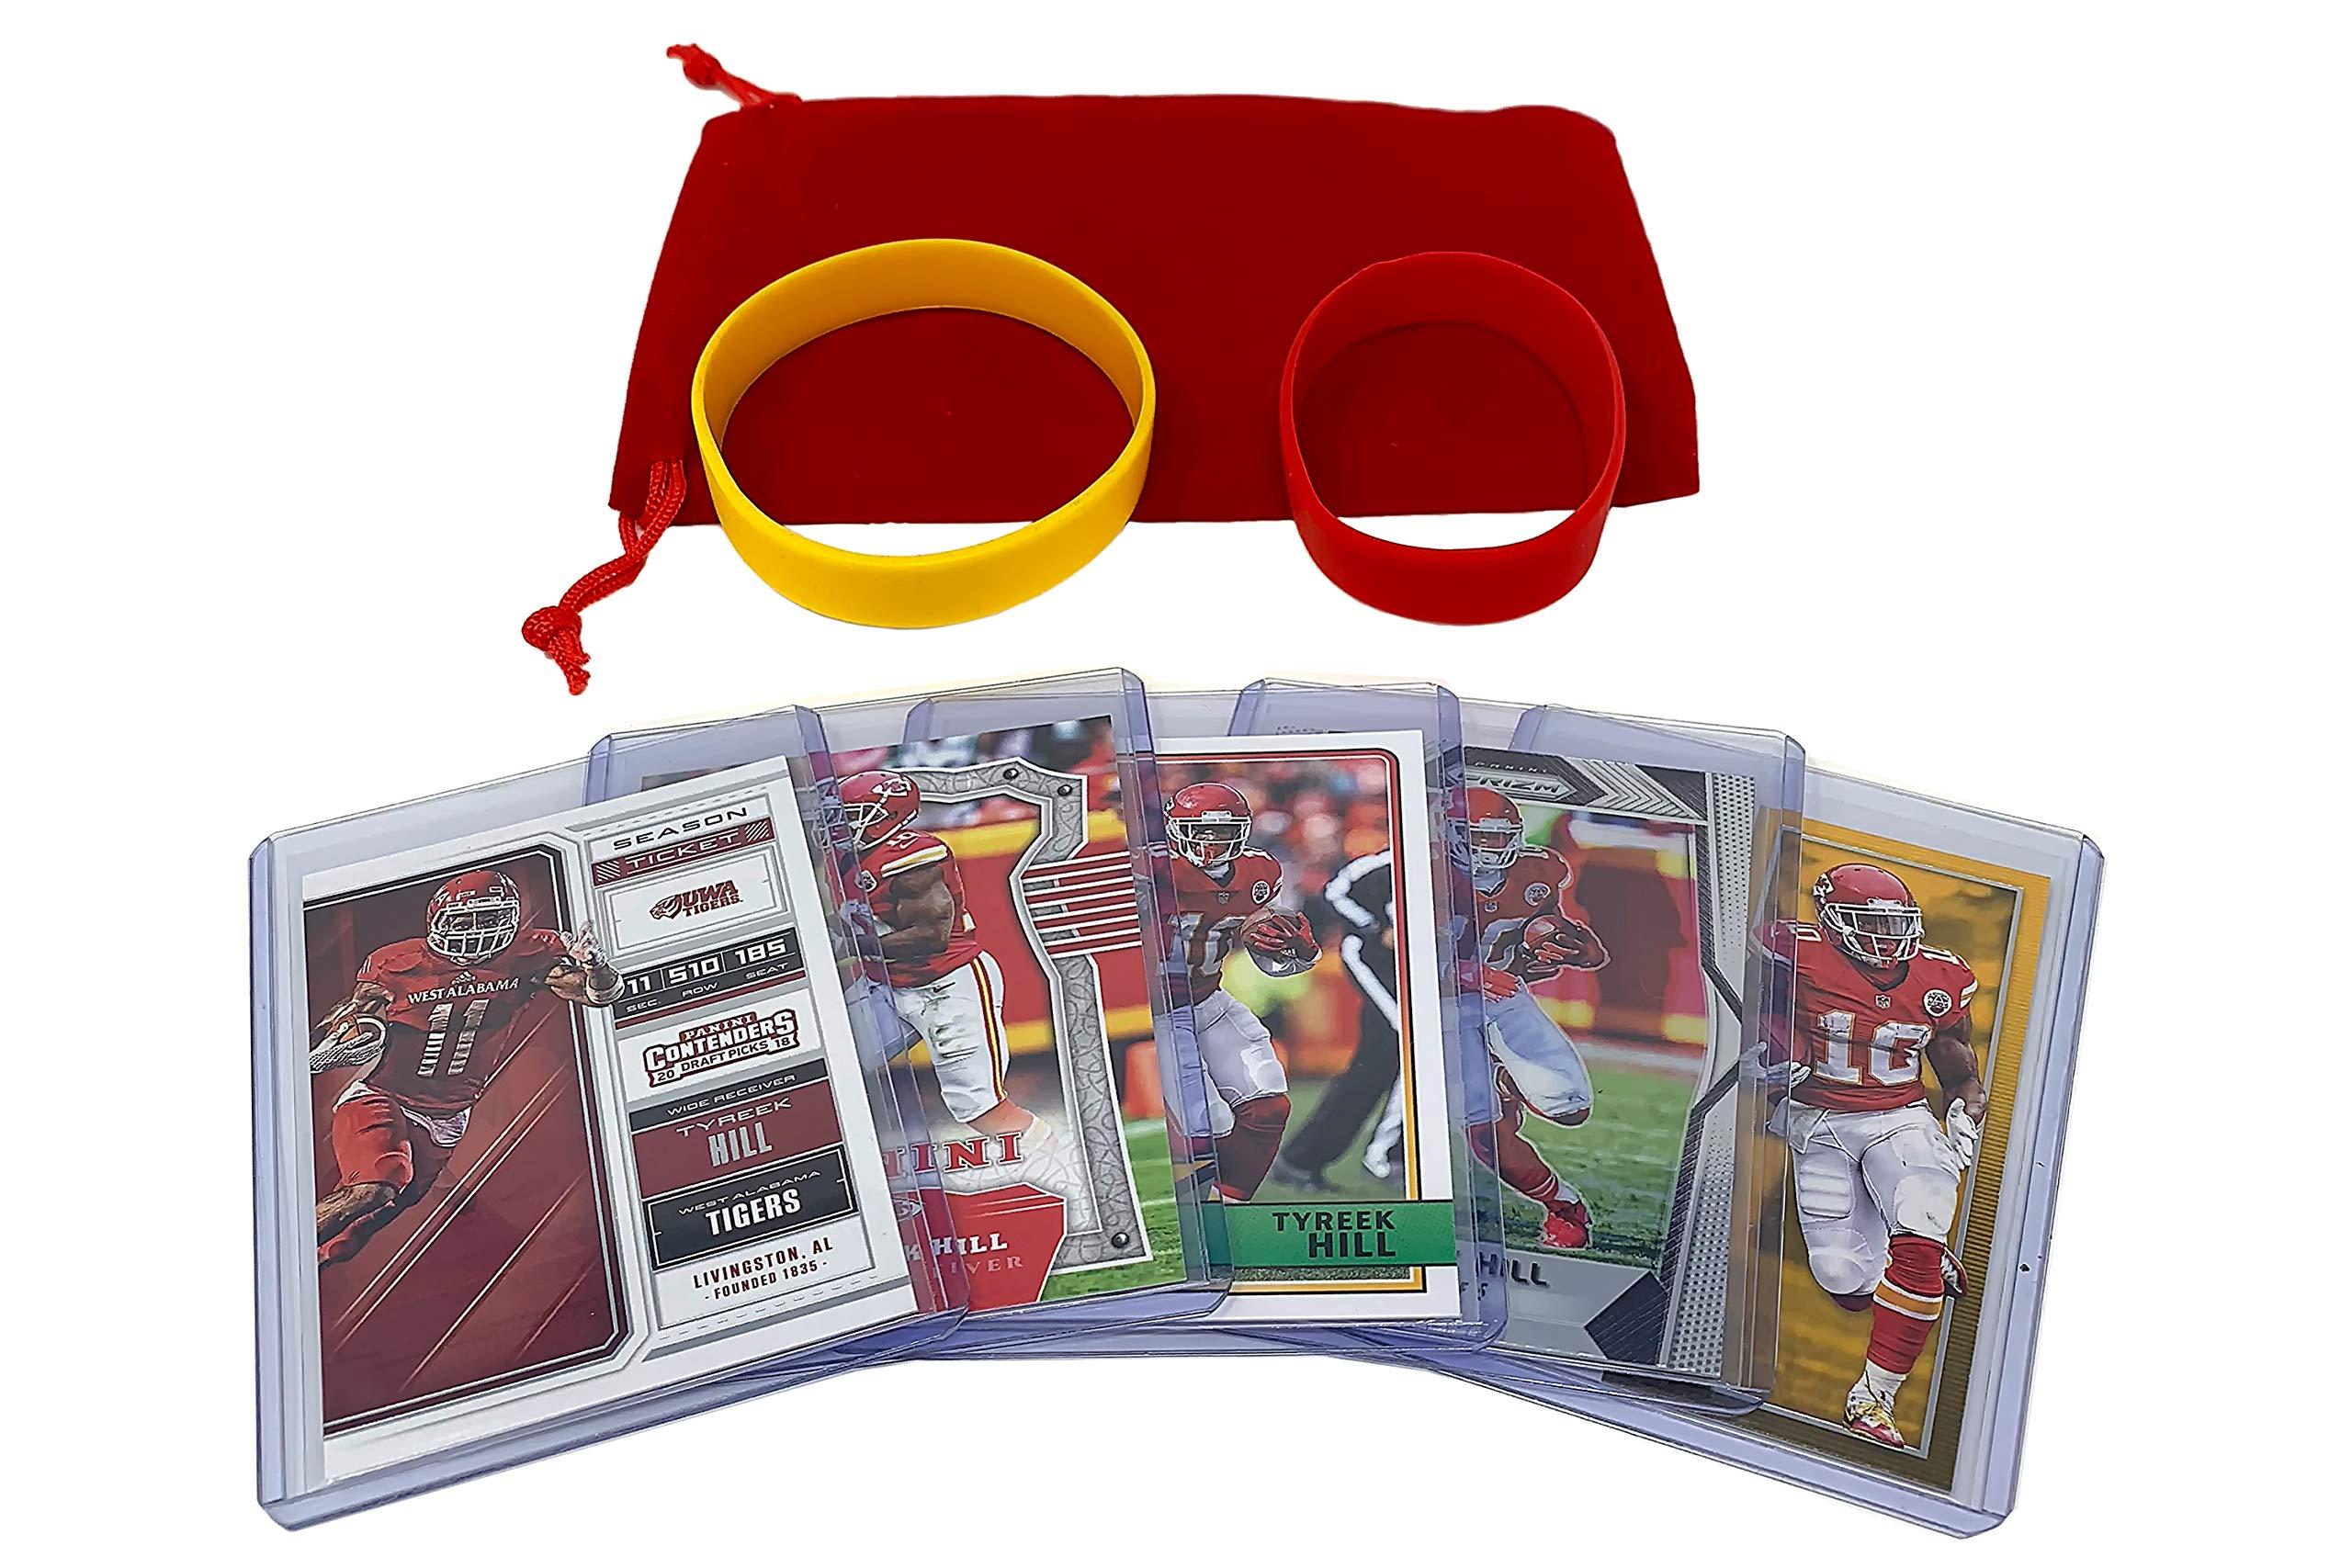 Tyreek Hill Football Cards (5) Assorted Bundle Kansas City Chiefs Trading Card Gift Set